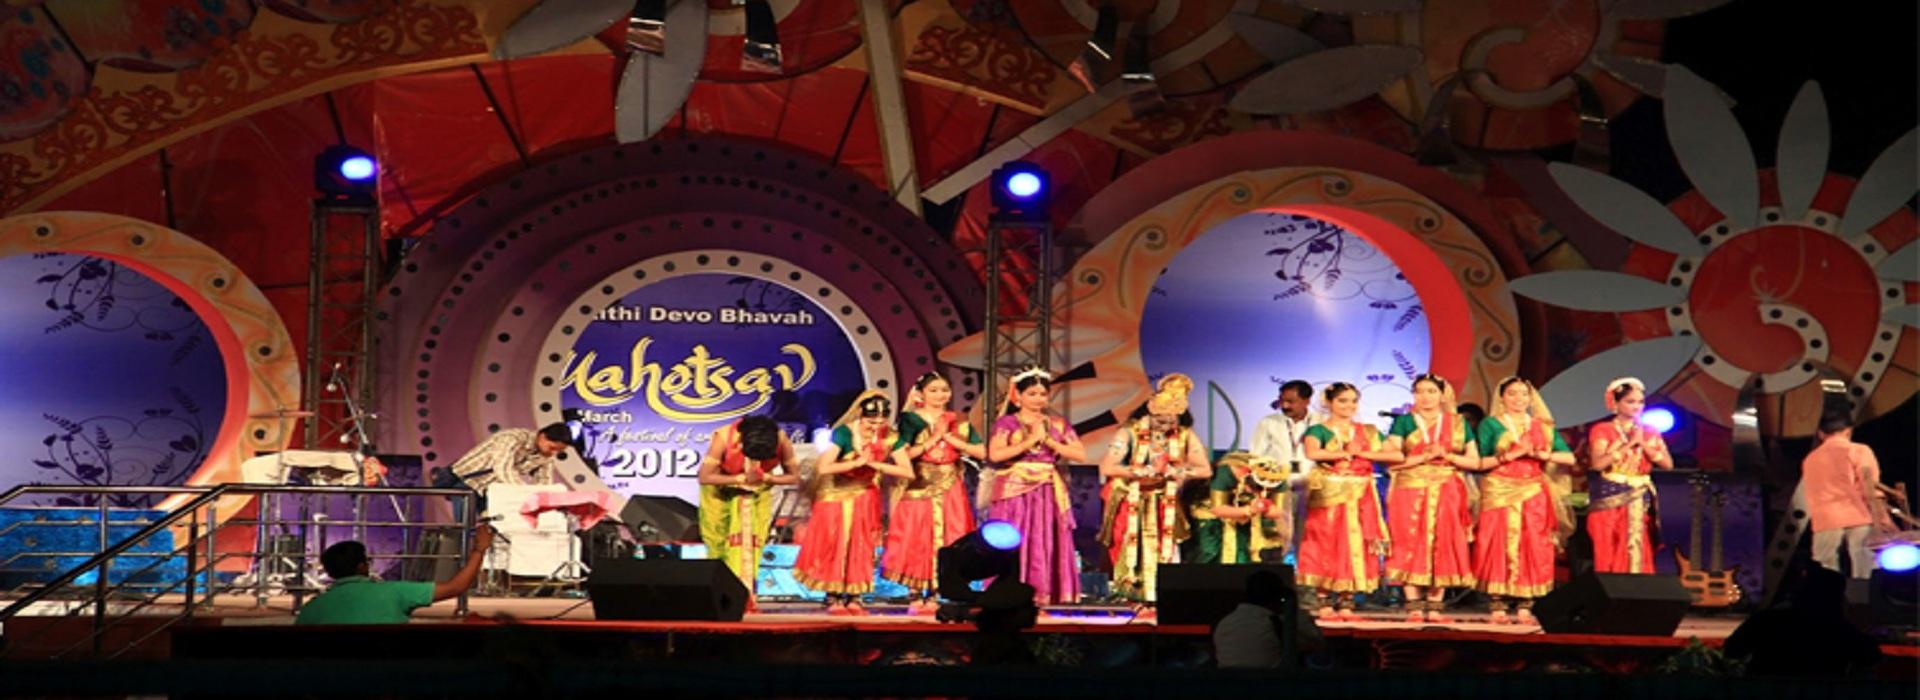 Taj Mahotsav- An Exposition of Agra Culture